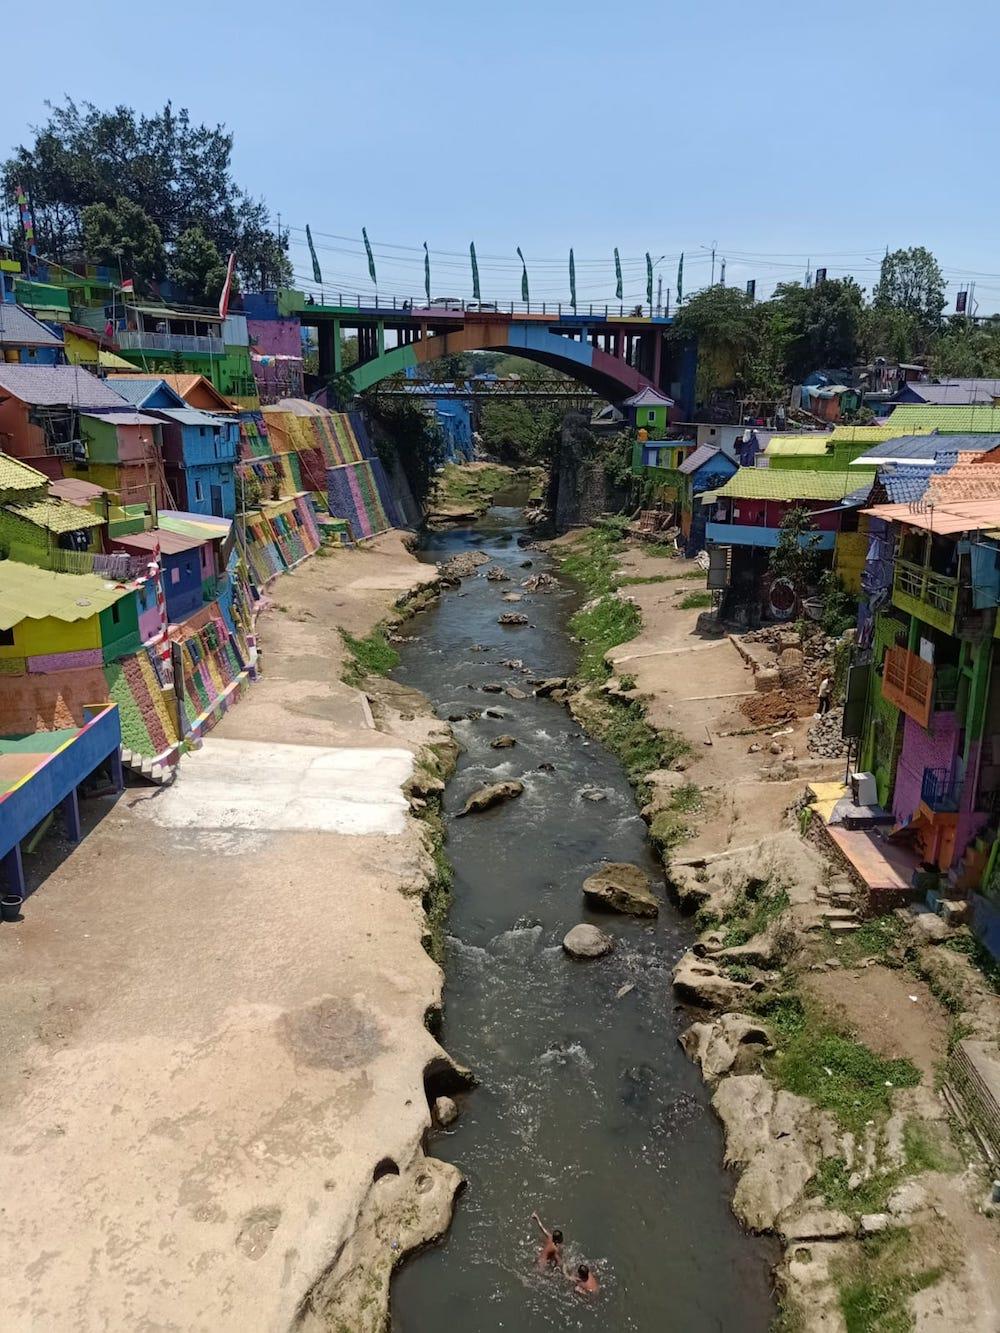 Fluss-Malang-Java-Indonesien